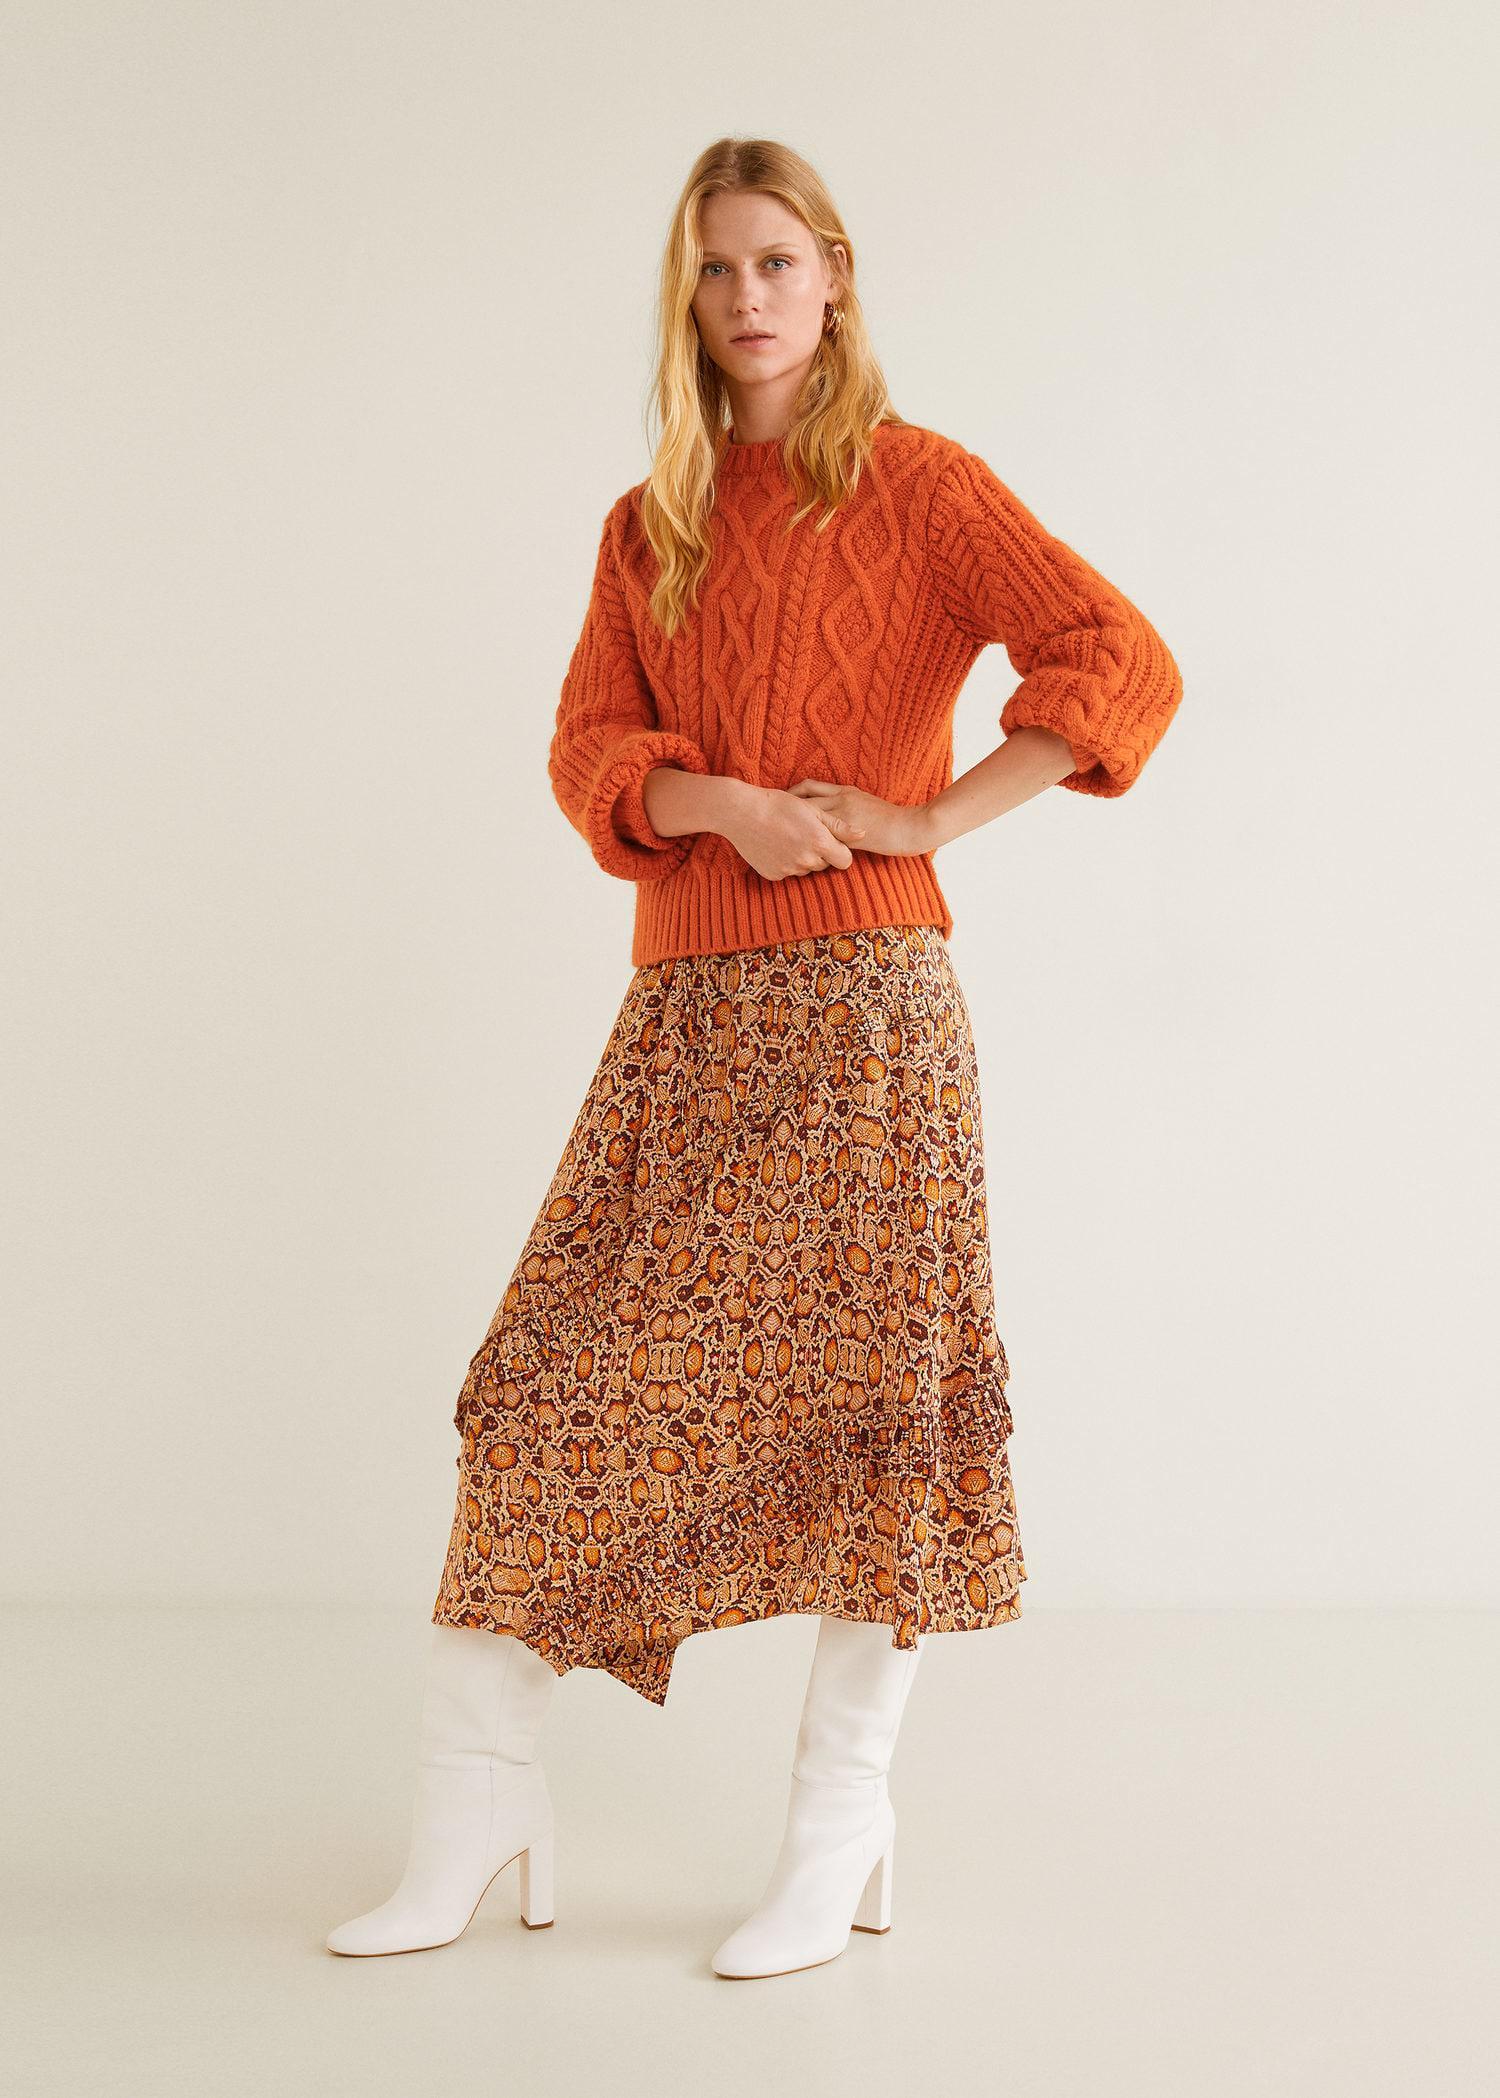 better best loved best quality Mango Contrasting Knit Sweater in Orange - Lyst